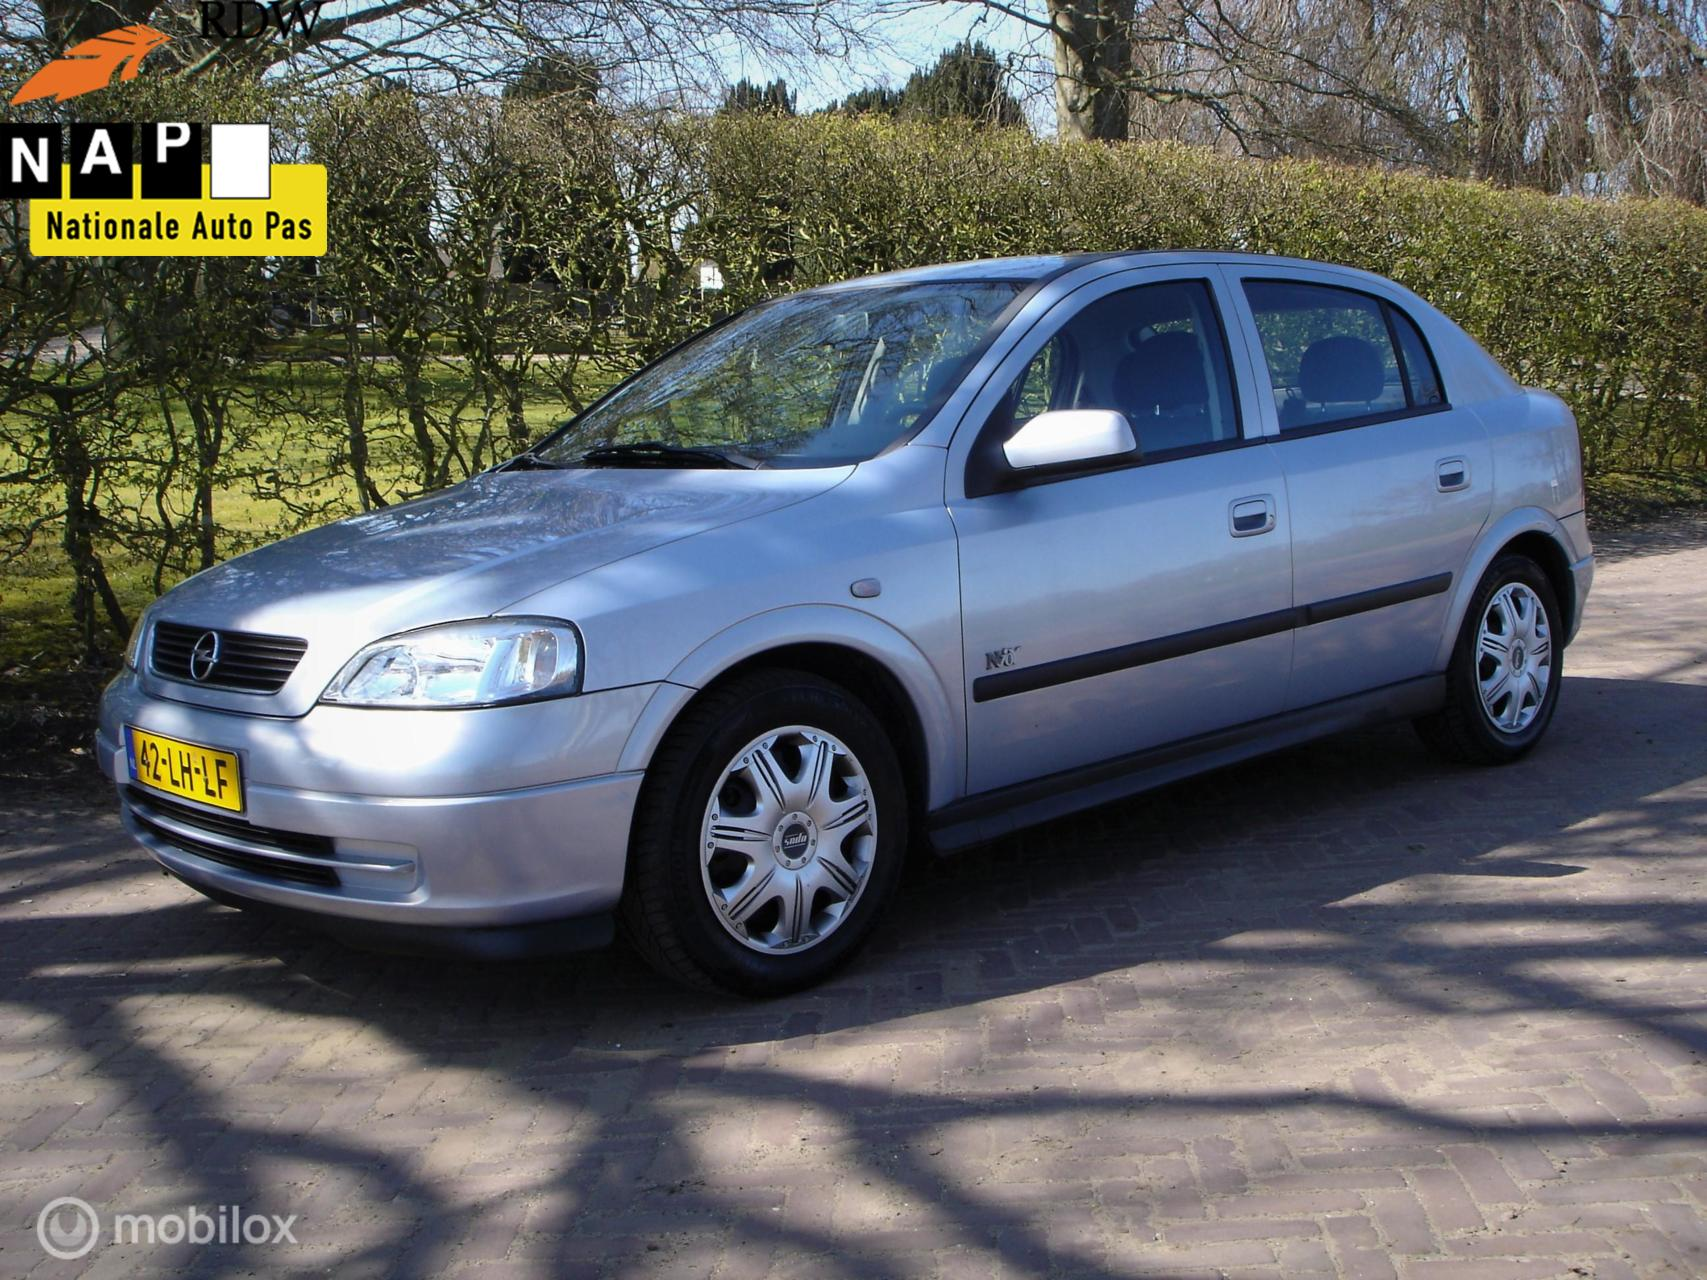 Opel Astra 1.6-16V Njoy (Bj 2003) Airco/5-Dr/APK/13-02-2022'